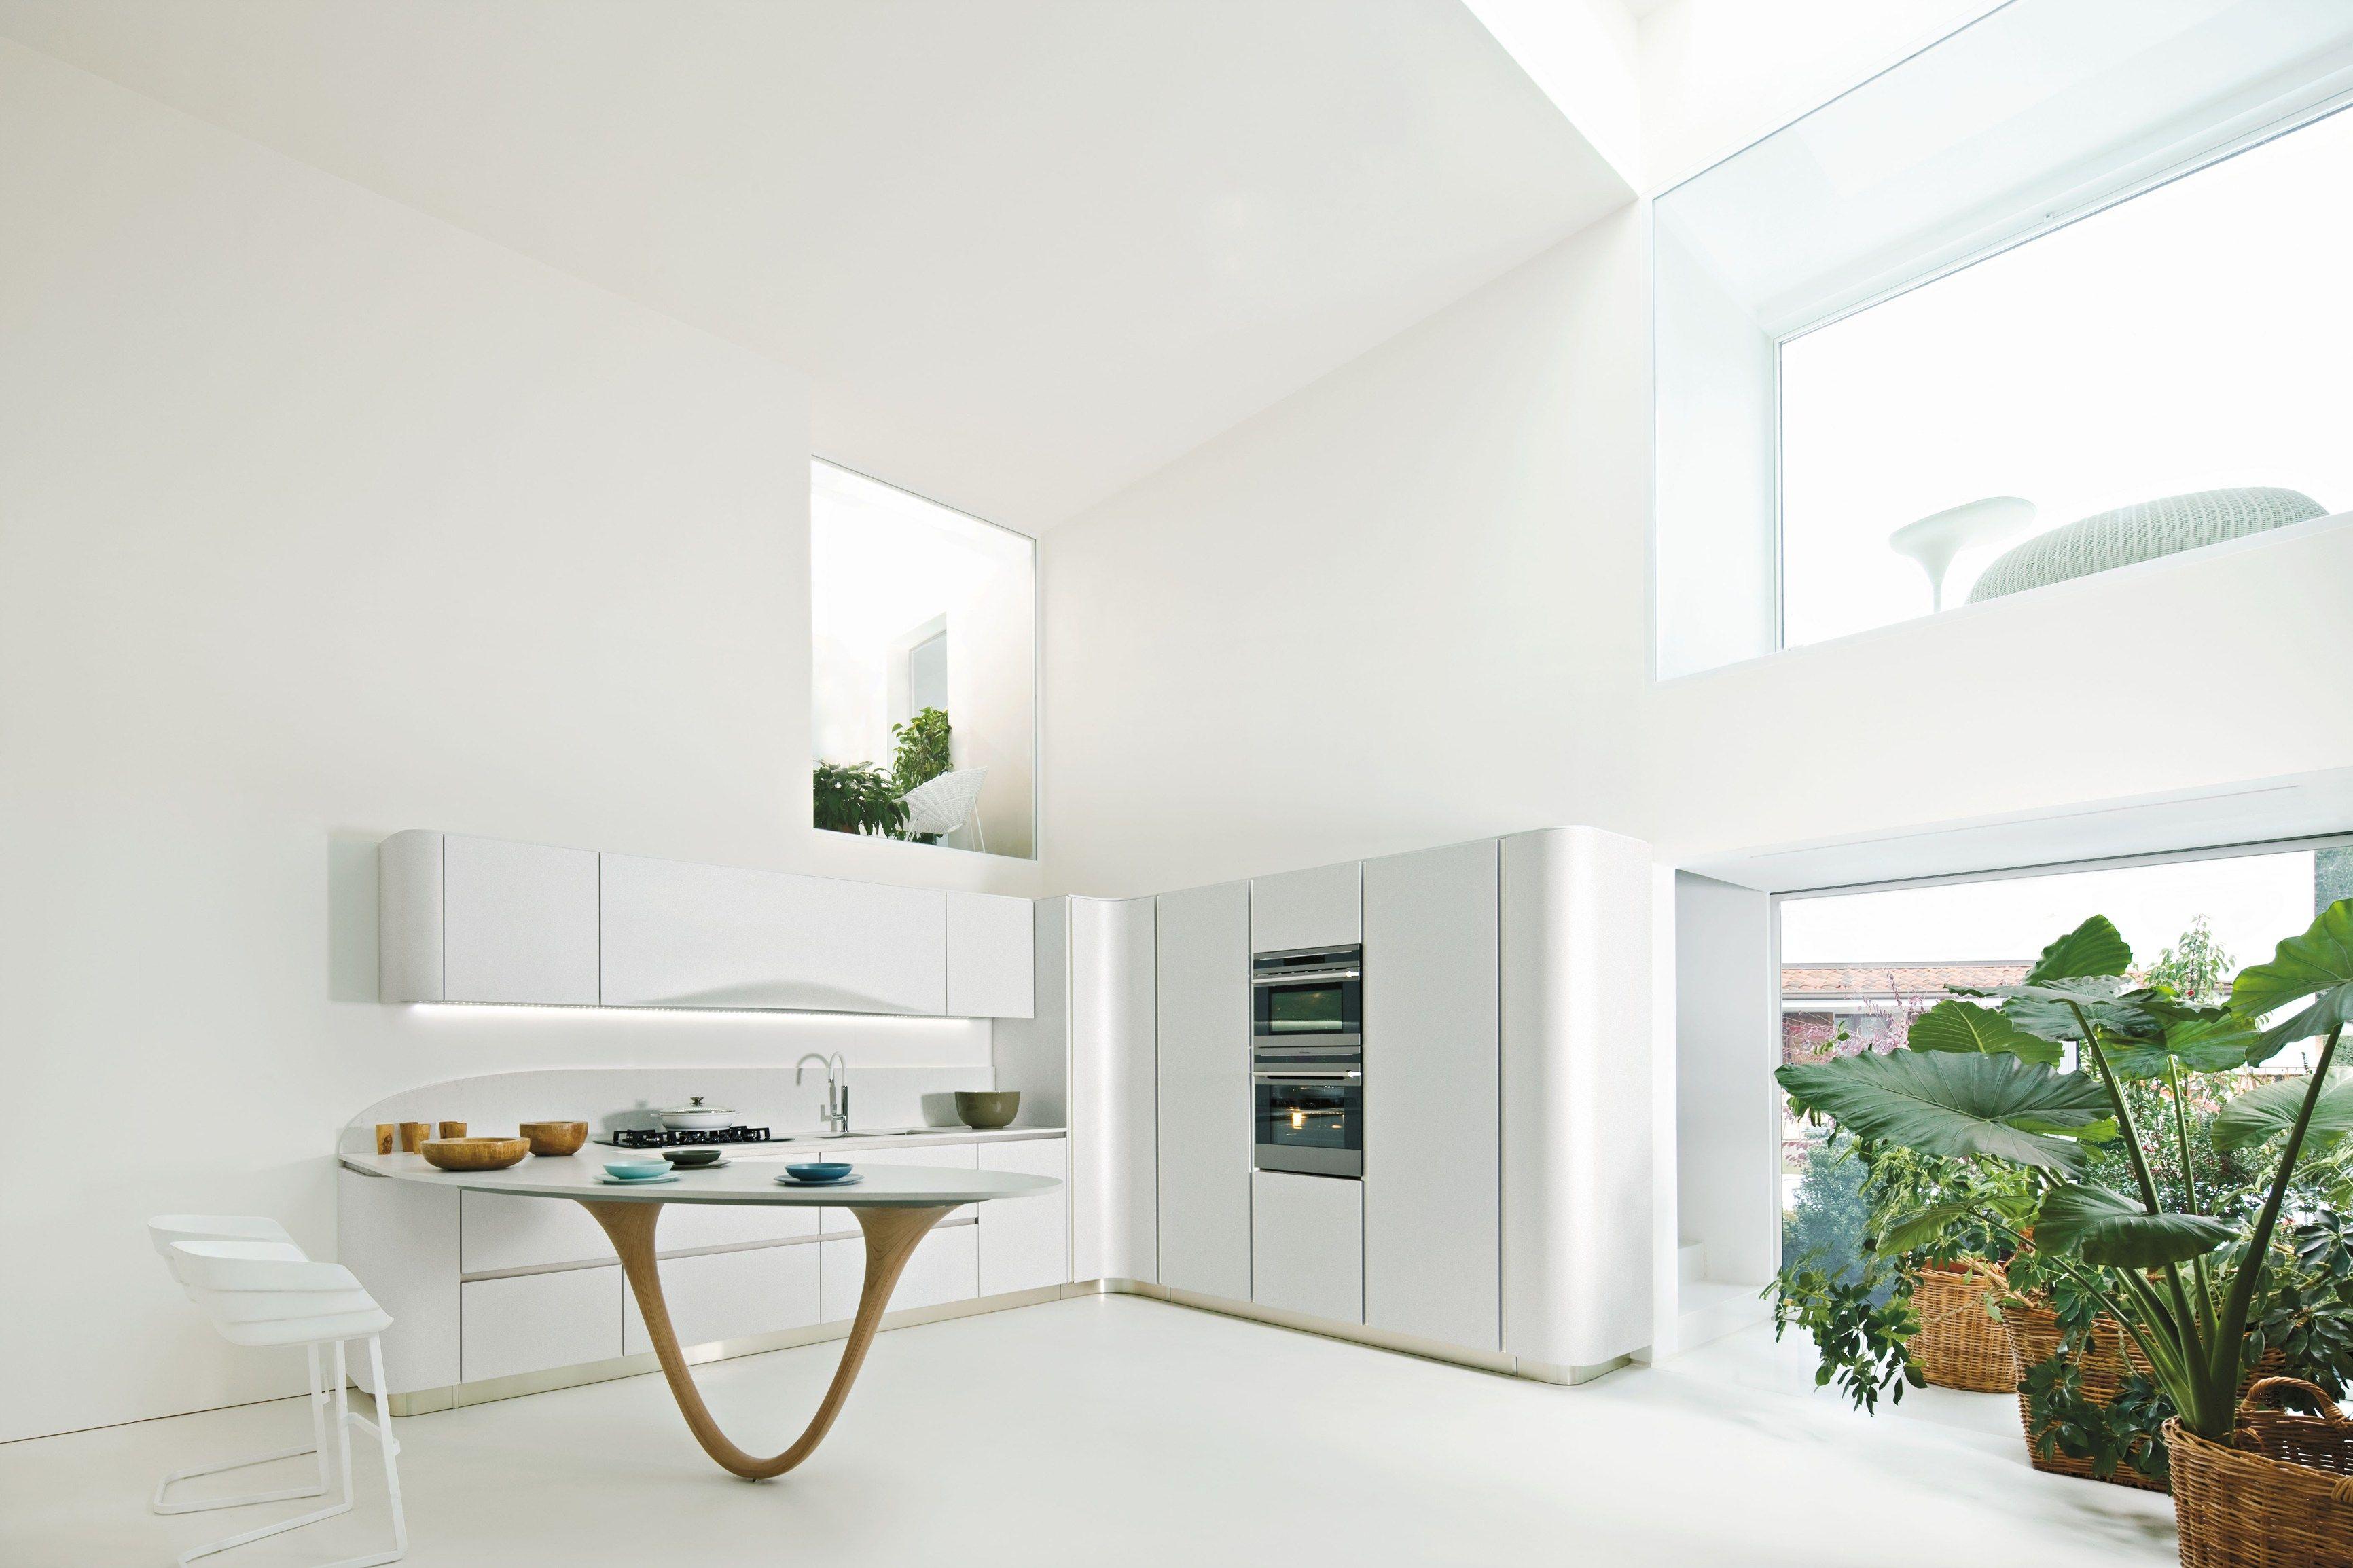 OLA 20 Cucina con penisola by Snaidero design Pininfarina